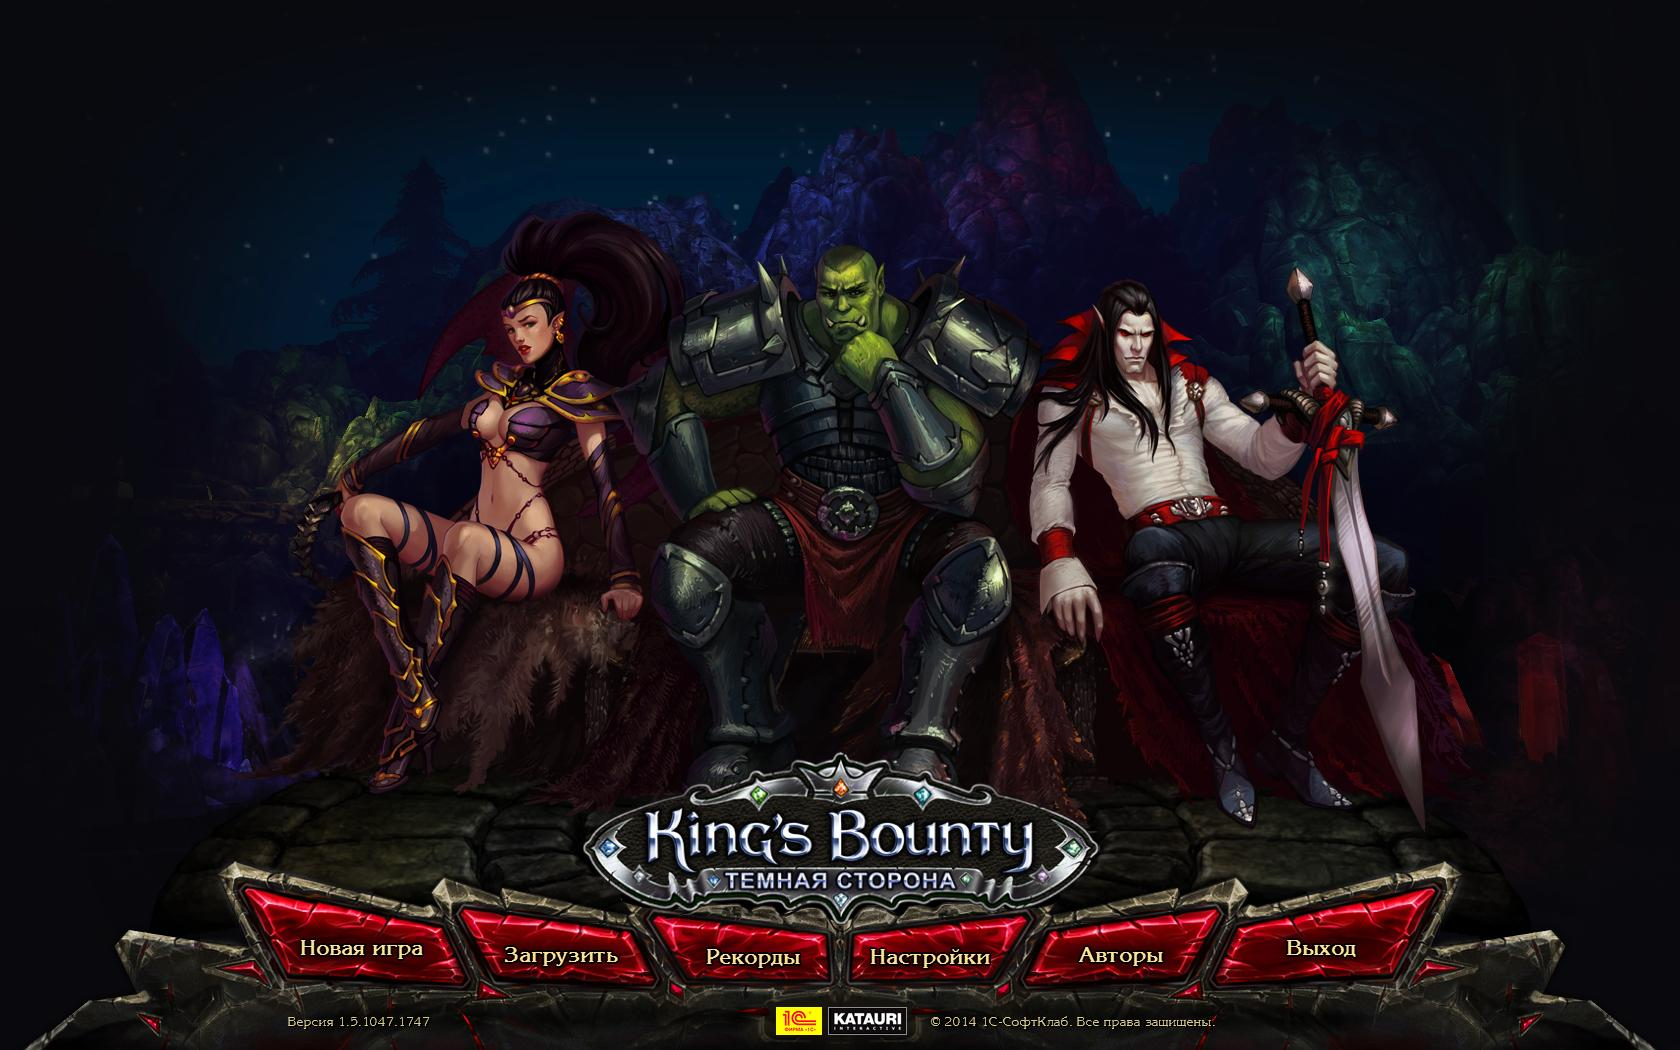 King's bounty nude mod sexy pics